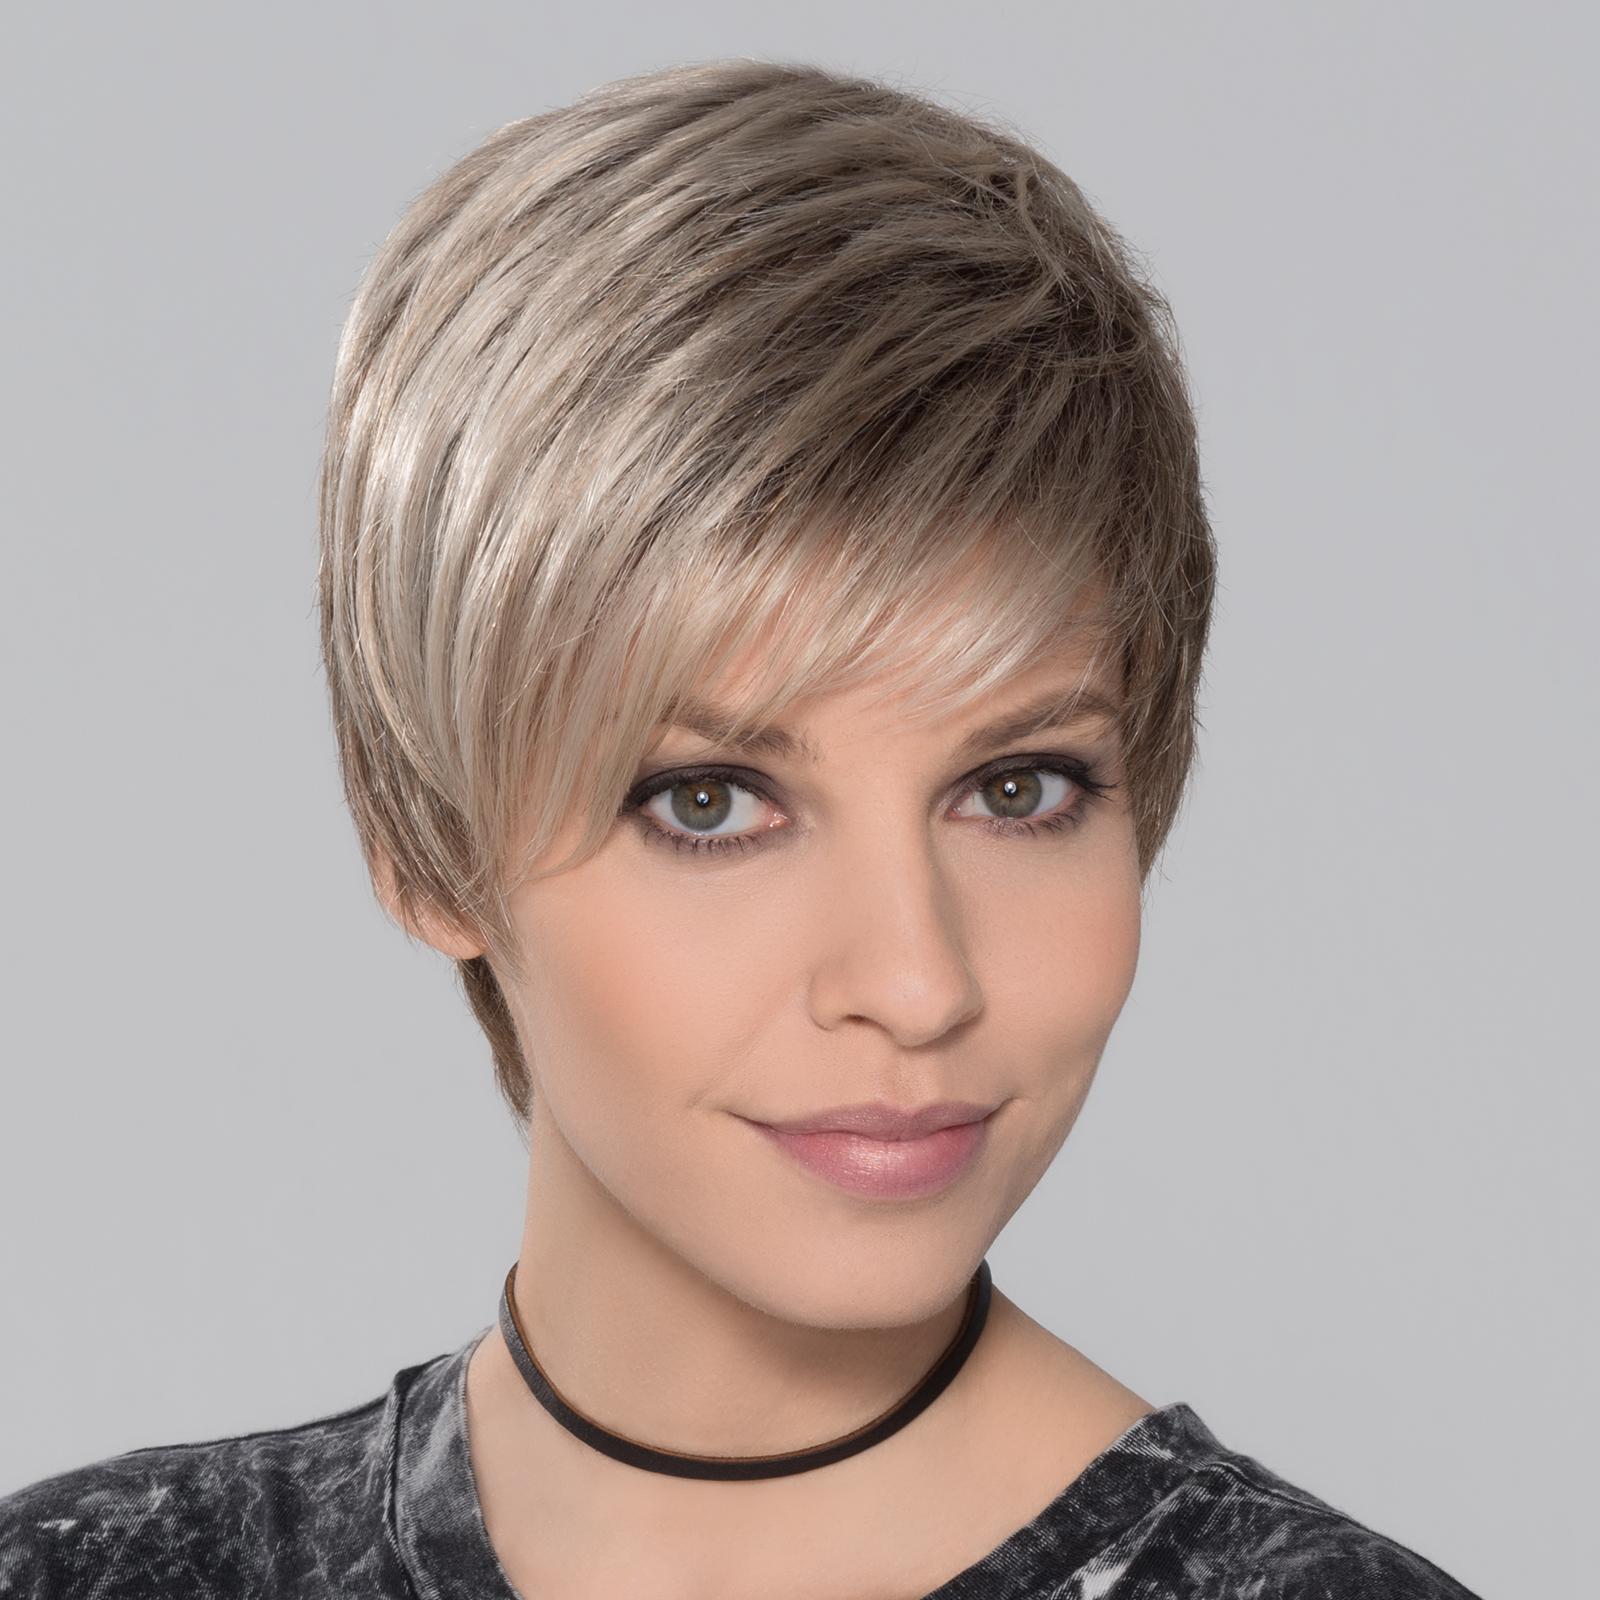 Paruka You  Hairpower+dárek - Aloena.cz - Paruky Ostrava 880df31234